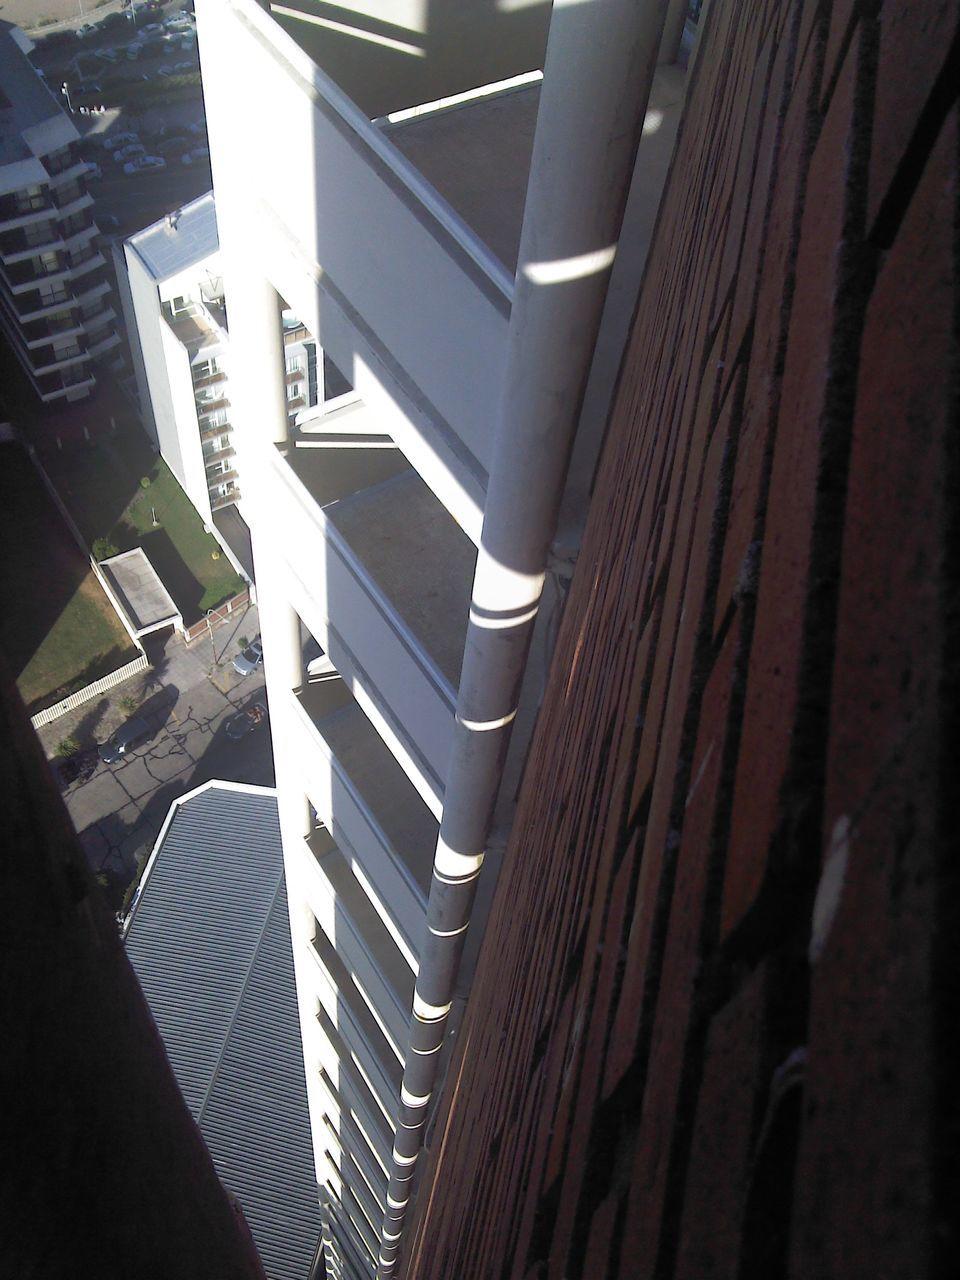 Directly Below Shot Of Building